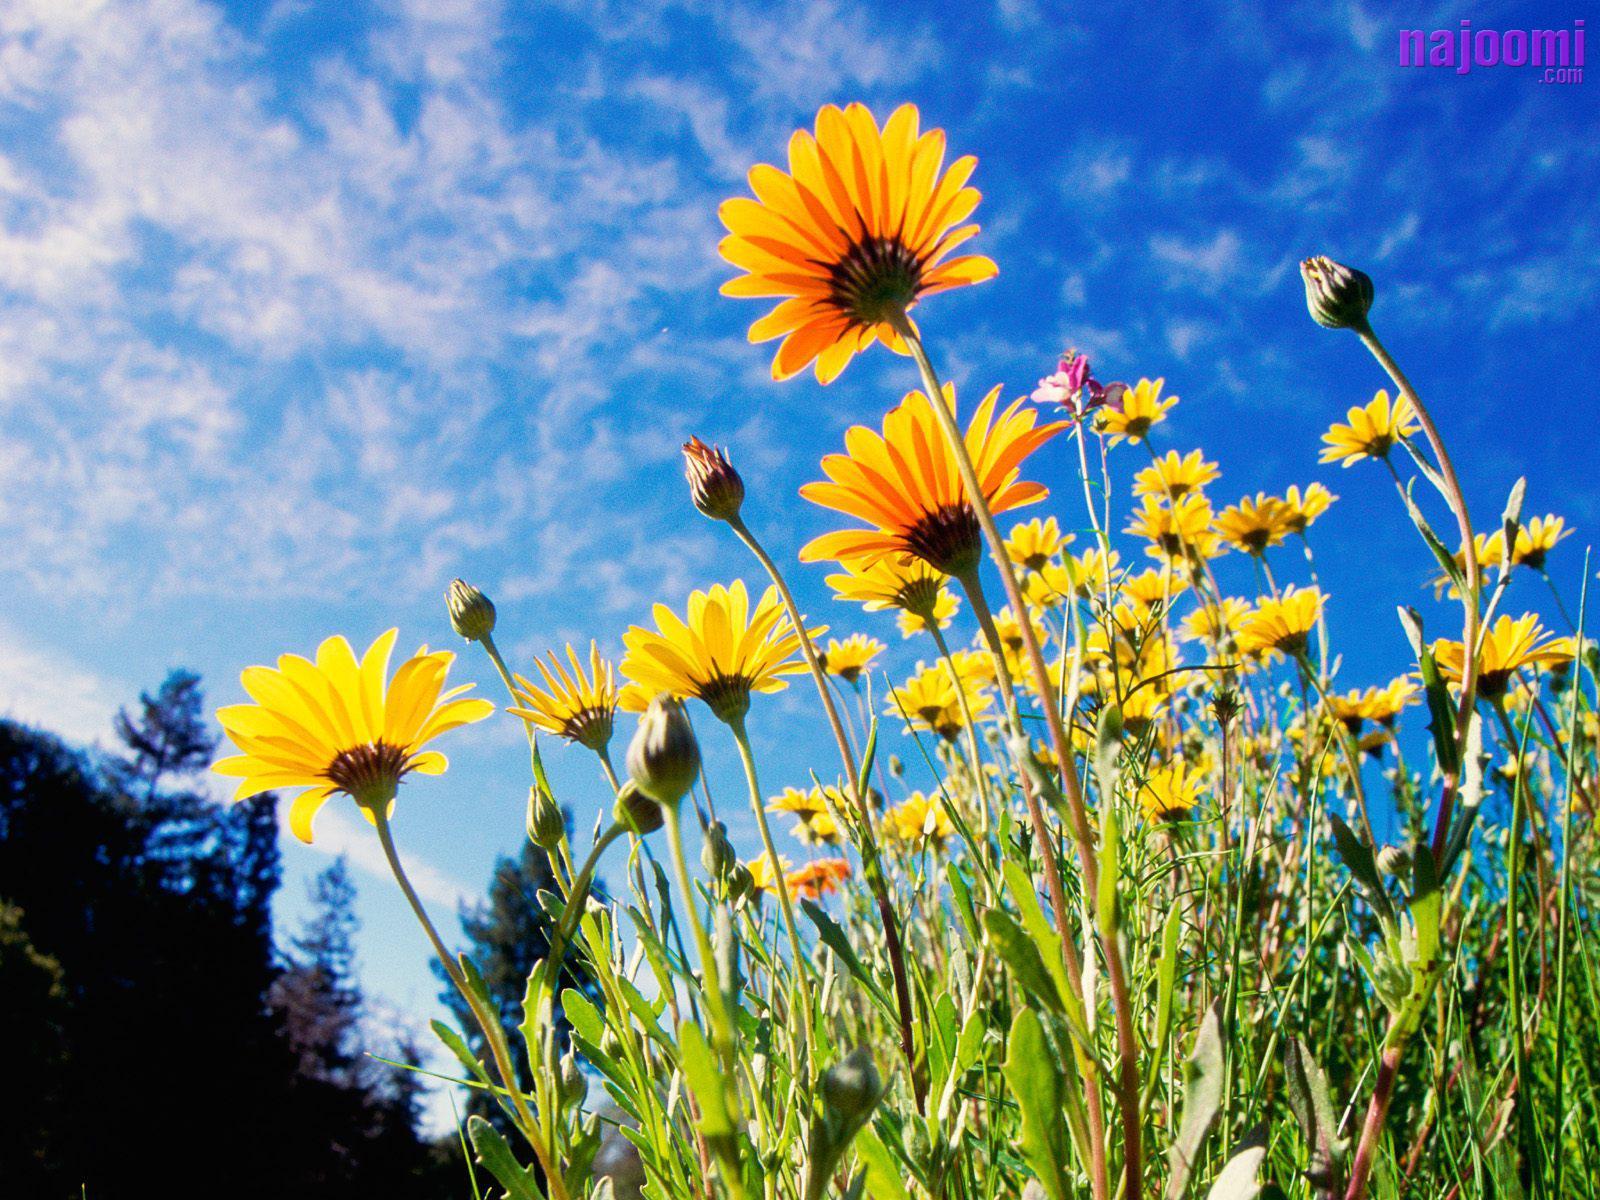 http://1.bp.blogspot.com/-49dsngqVMvg/TcQMK9cj8lI/AAAAAAAAKA8/flKdJU1TXYE/s1600/Many-Sun-Flowers-1600X1200-696.jpg